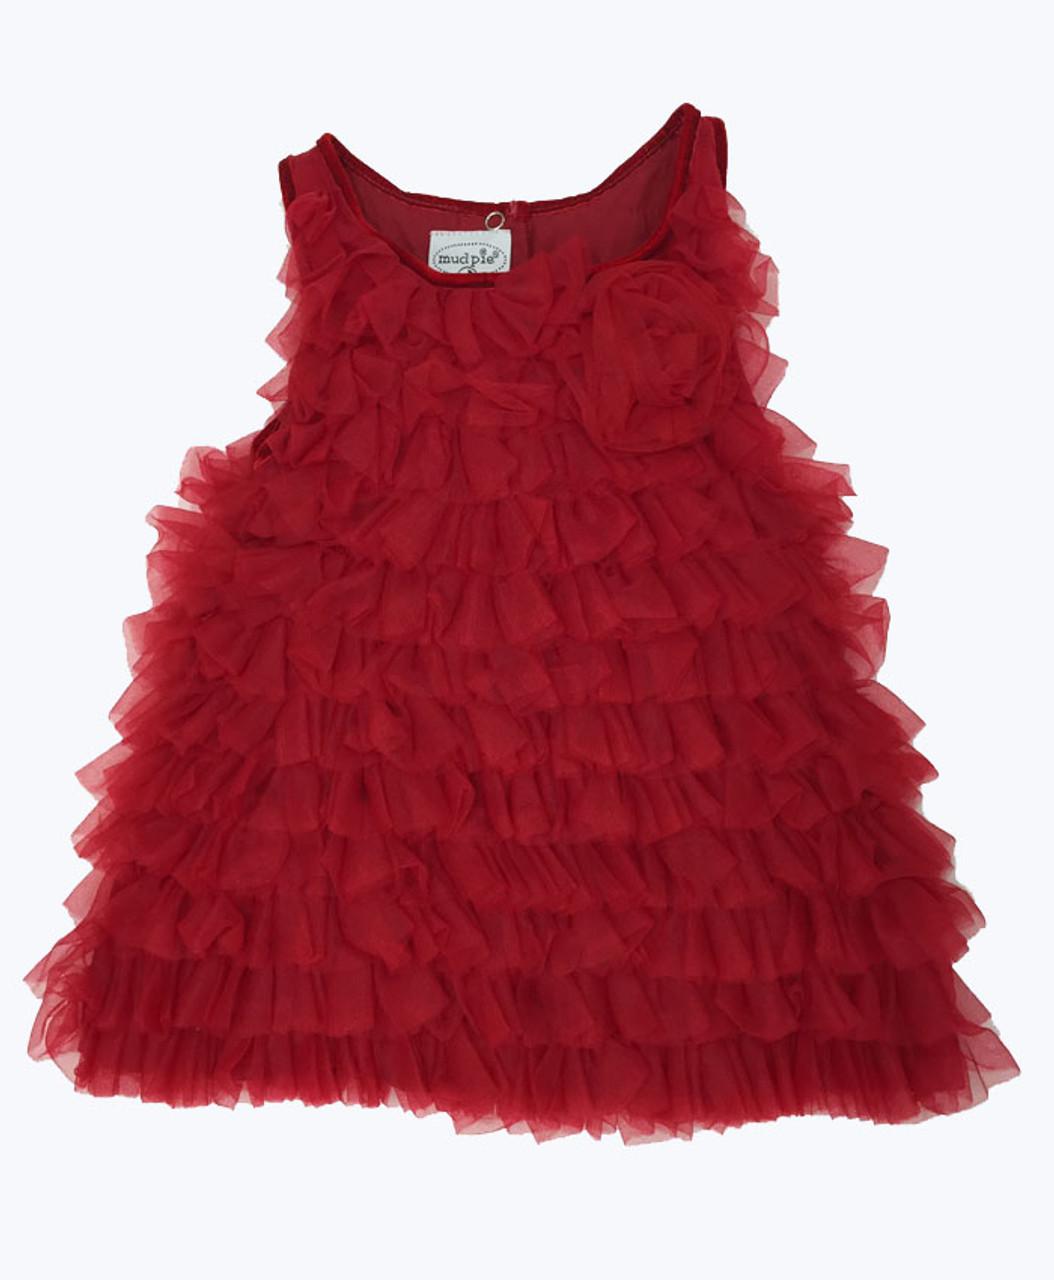 Mud Pie Baby Red Chiffon Dress